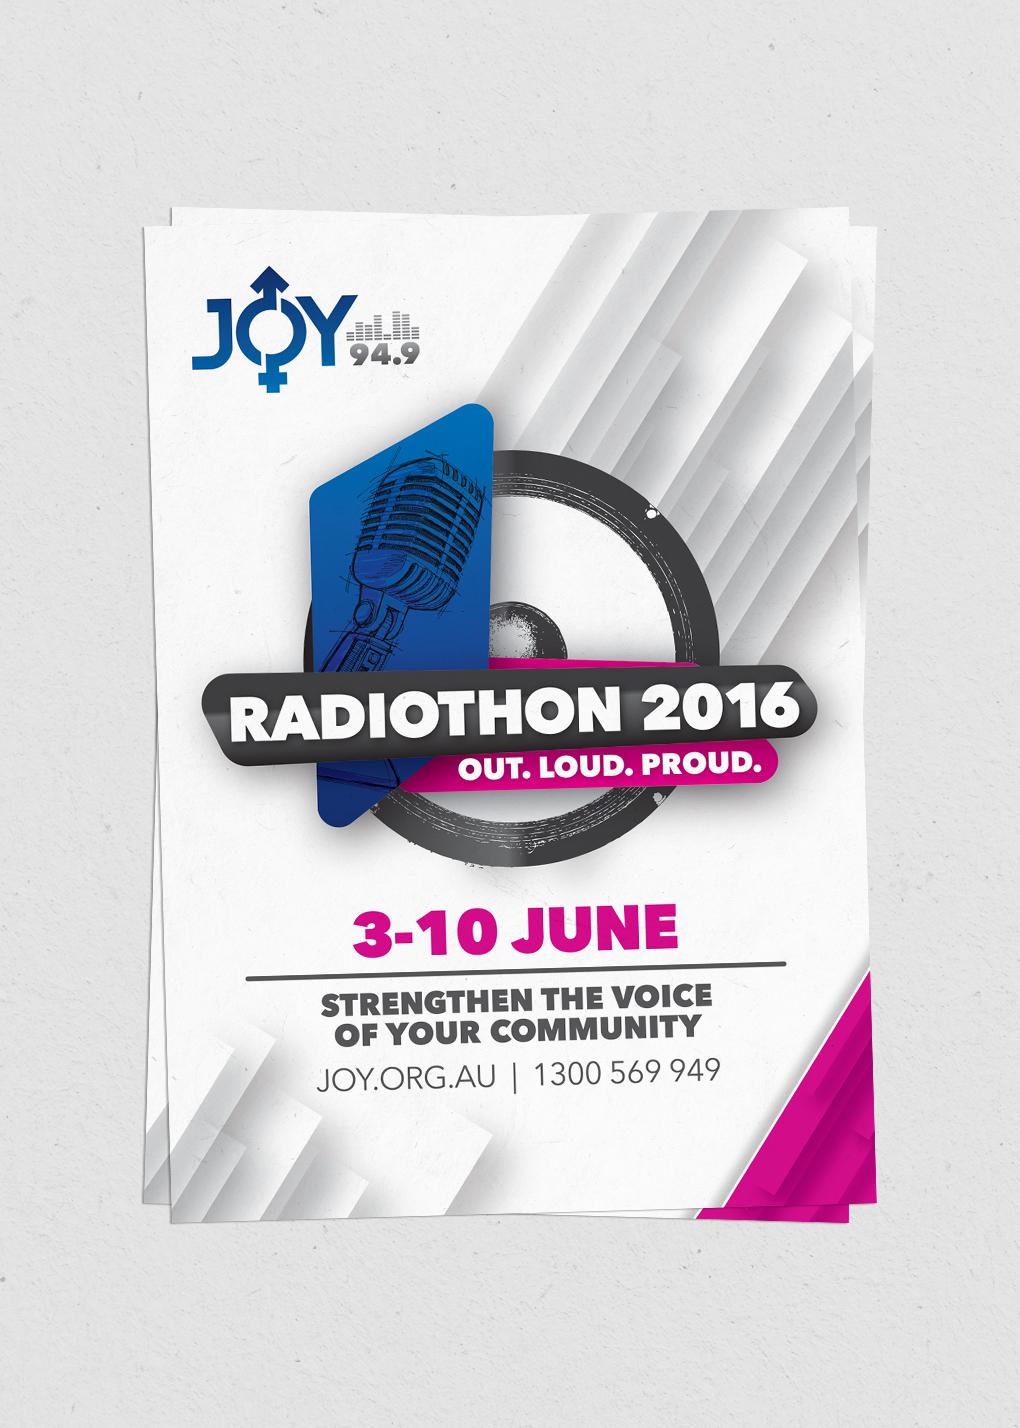 JOY 94.9 Radiothon Campaign